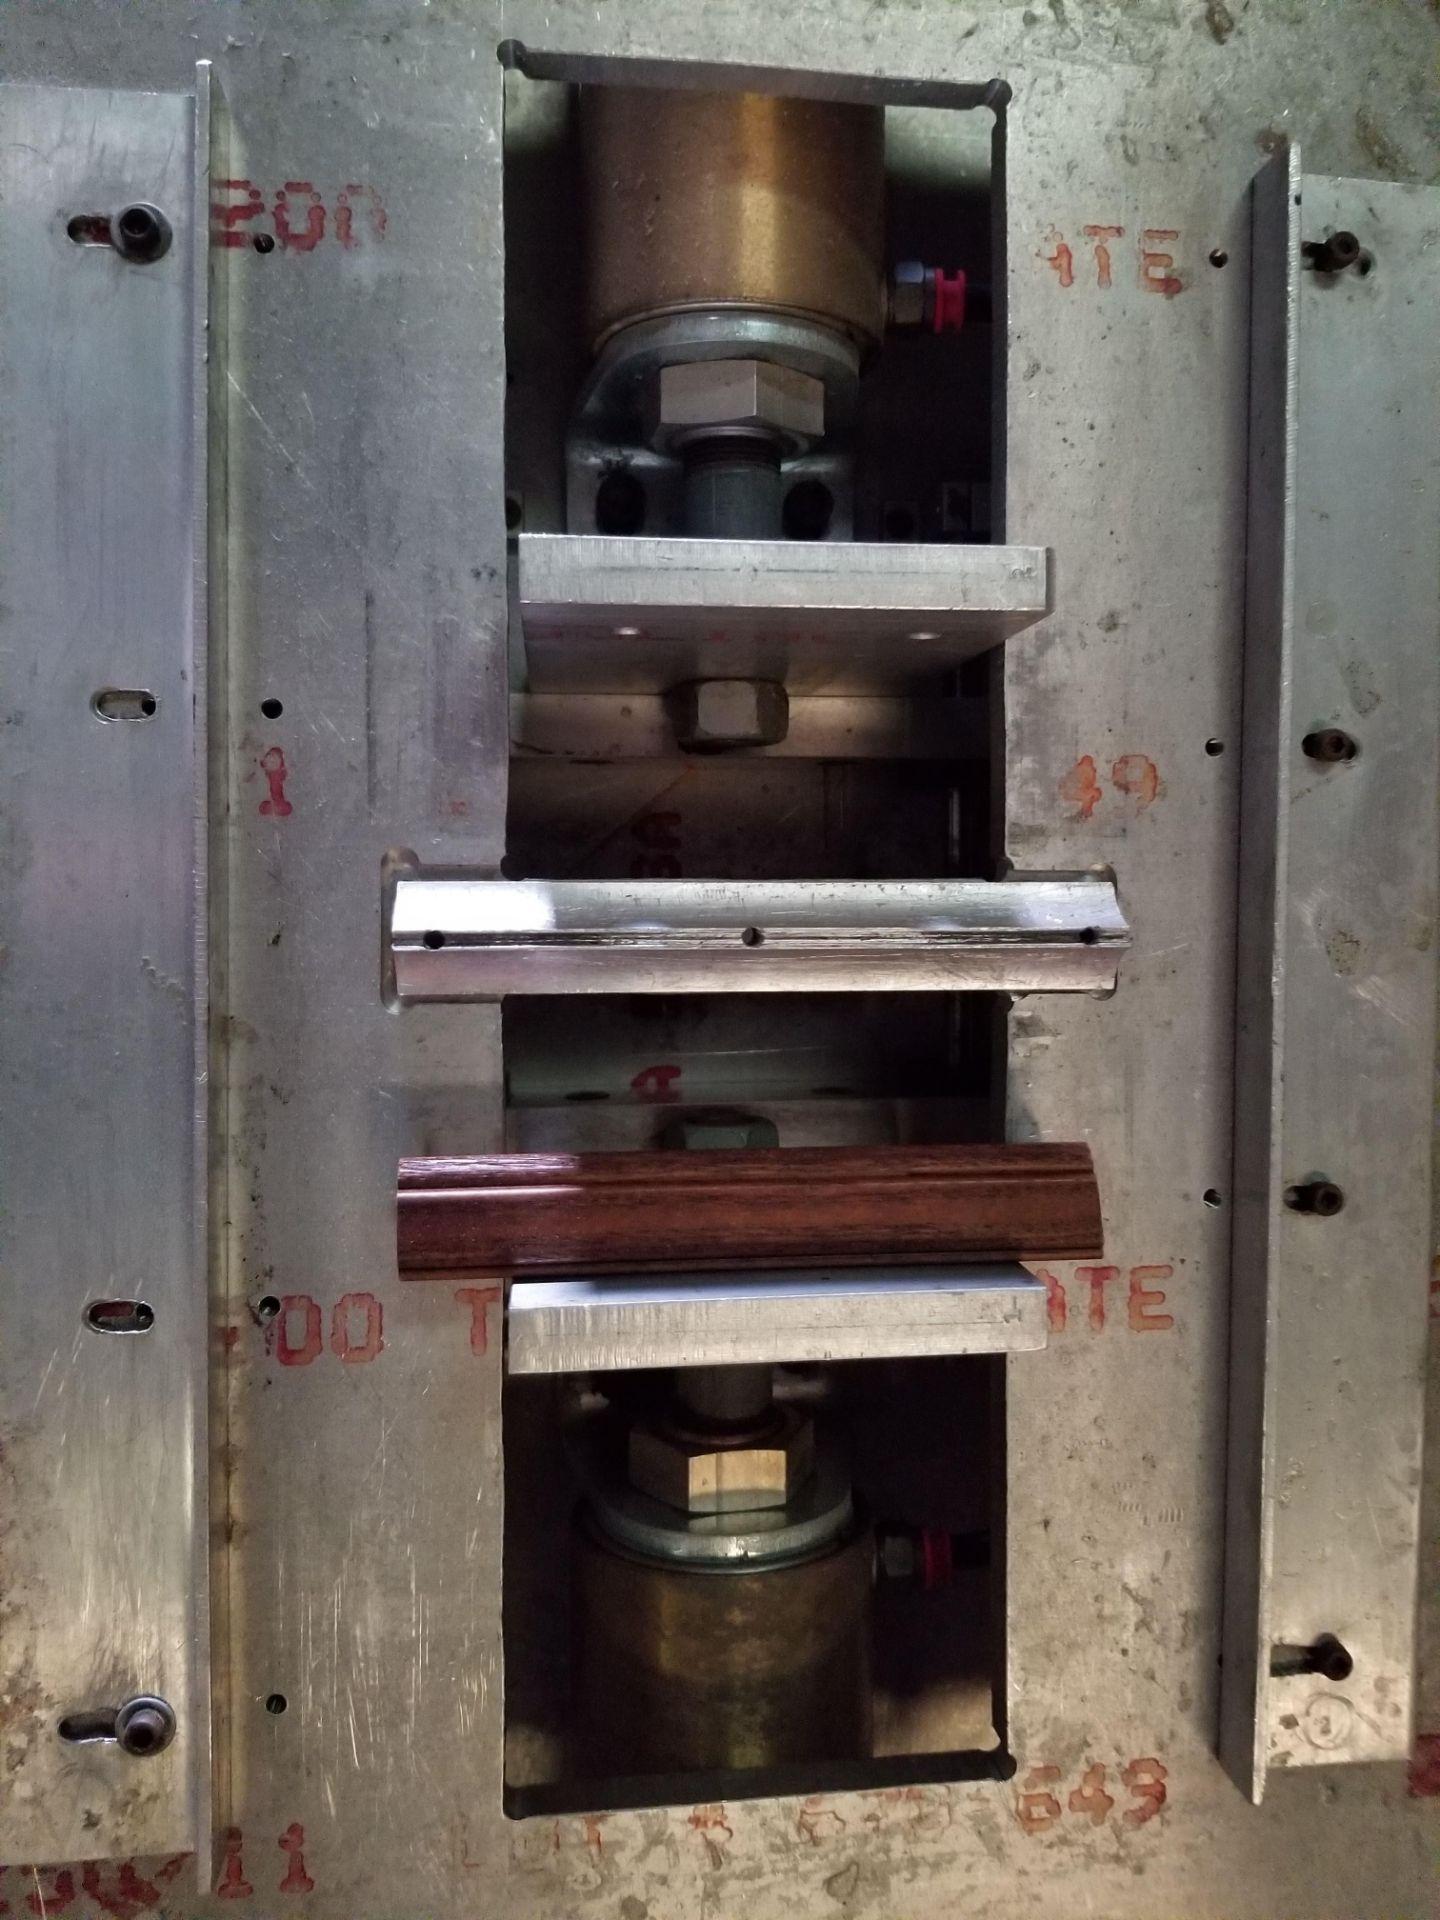 Pnuematic Press w/ Aluminum Table - Image 4 of 5